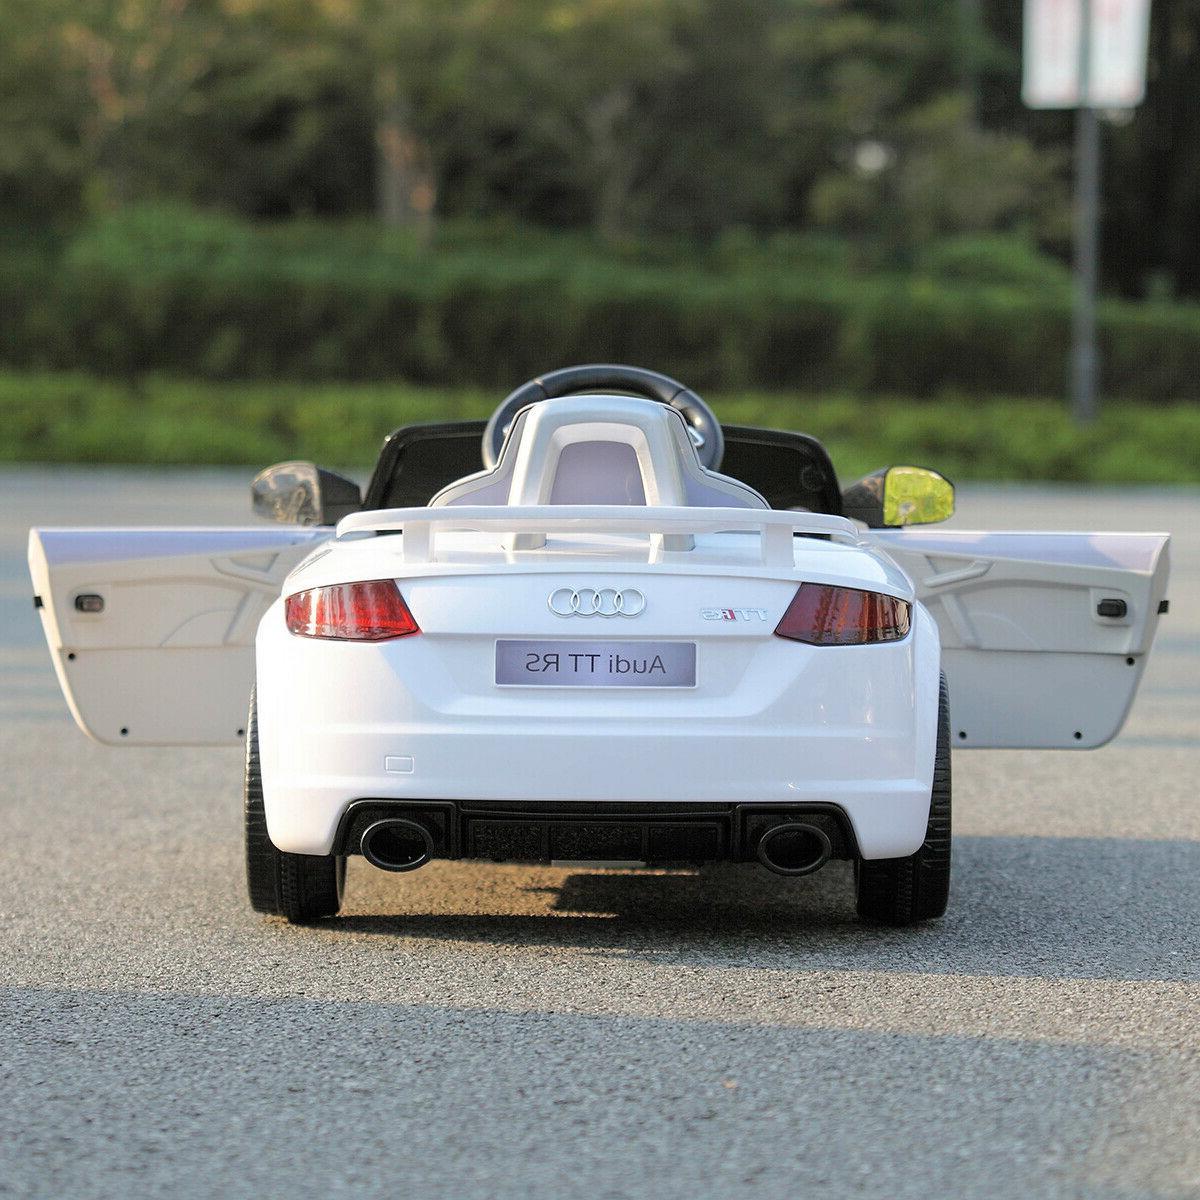 Audi RS Toys Car Motor